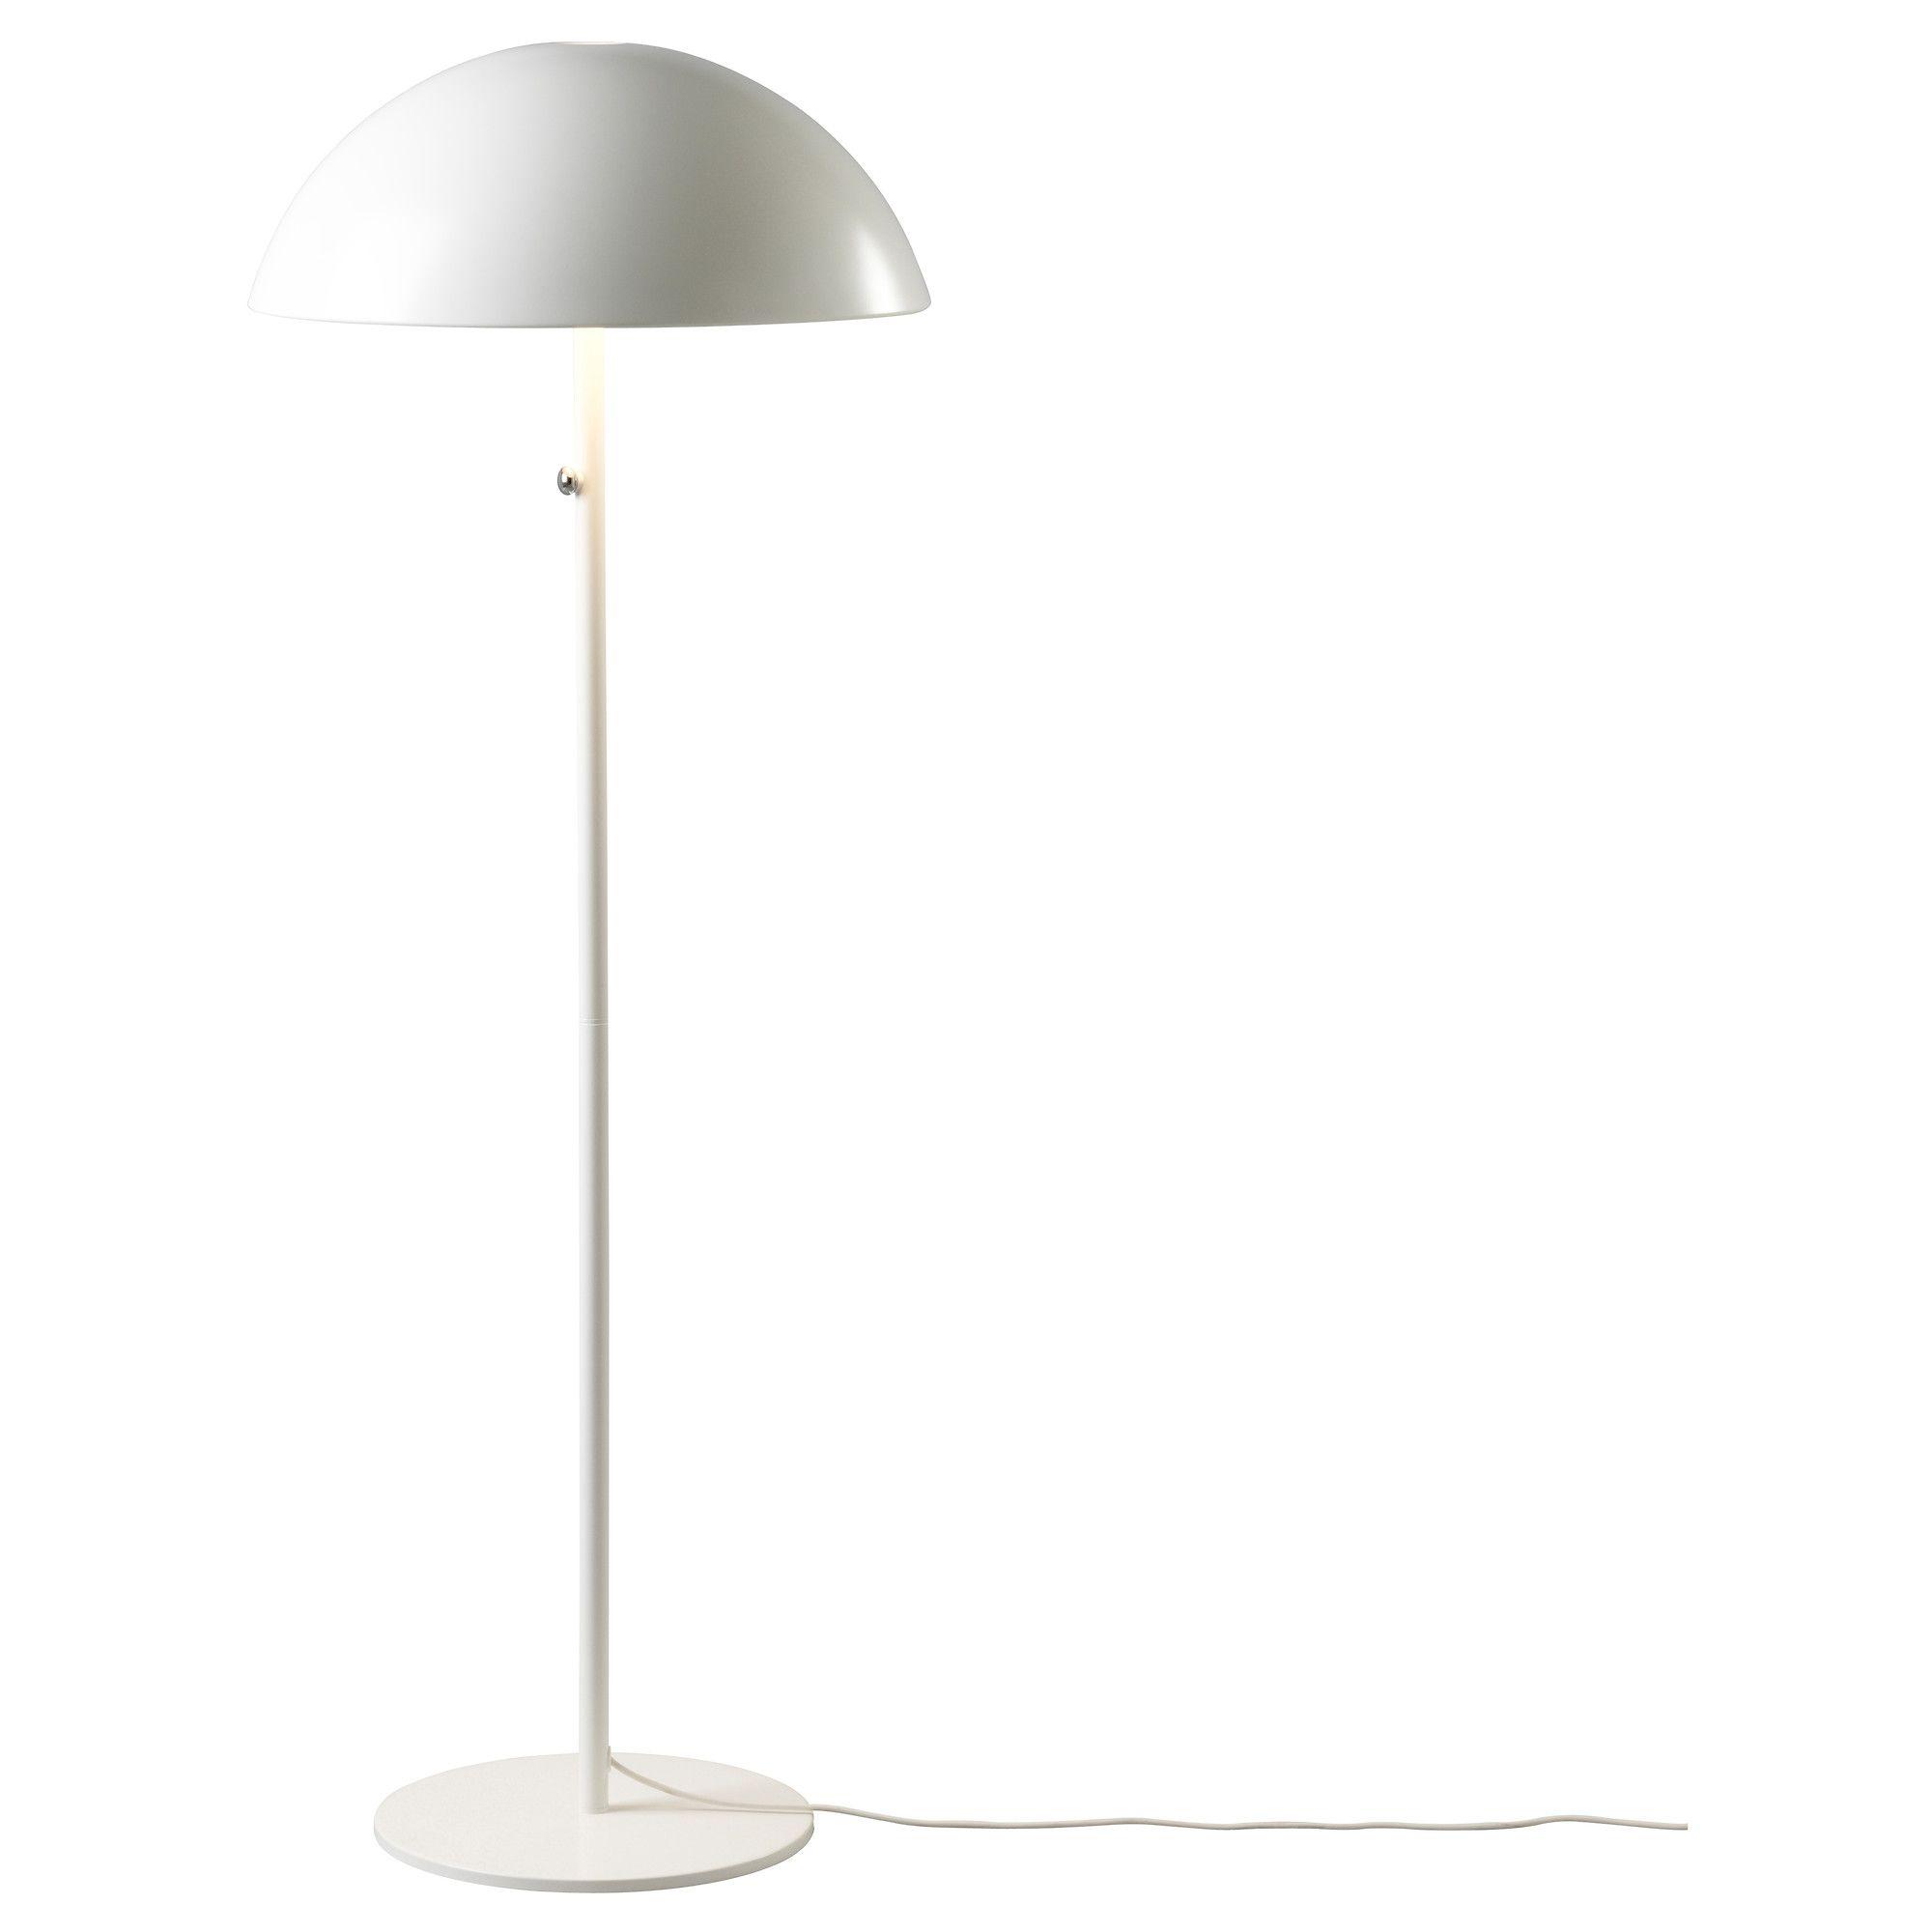 Ikea 365 Brasa Floor Lamp